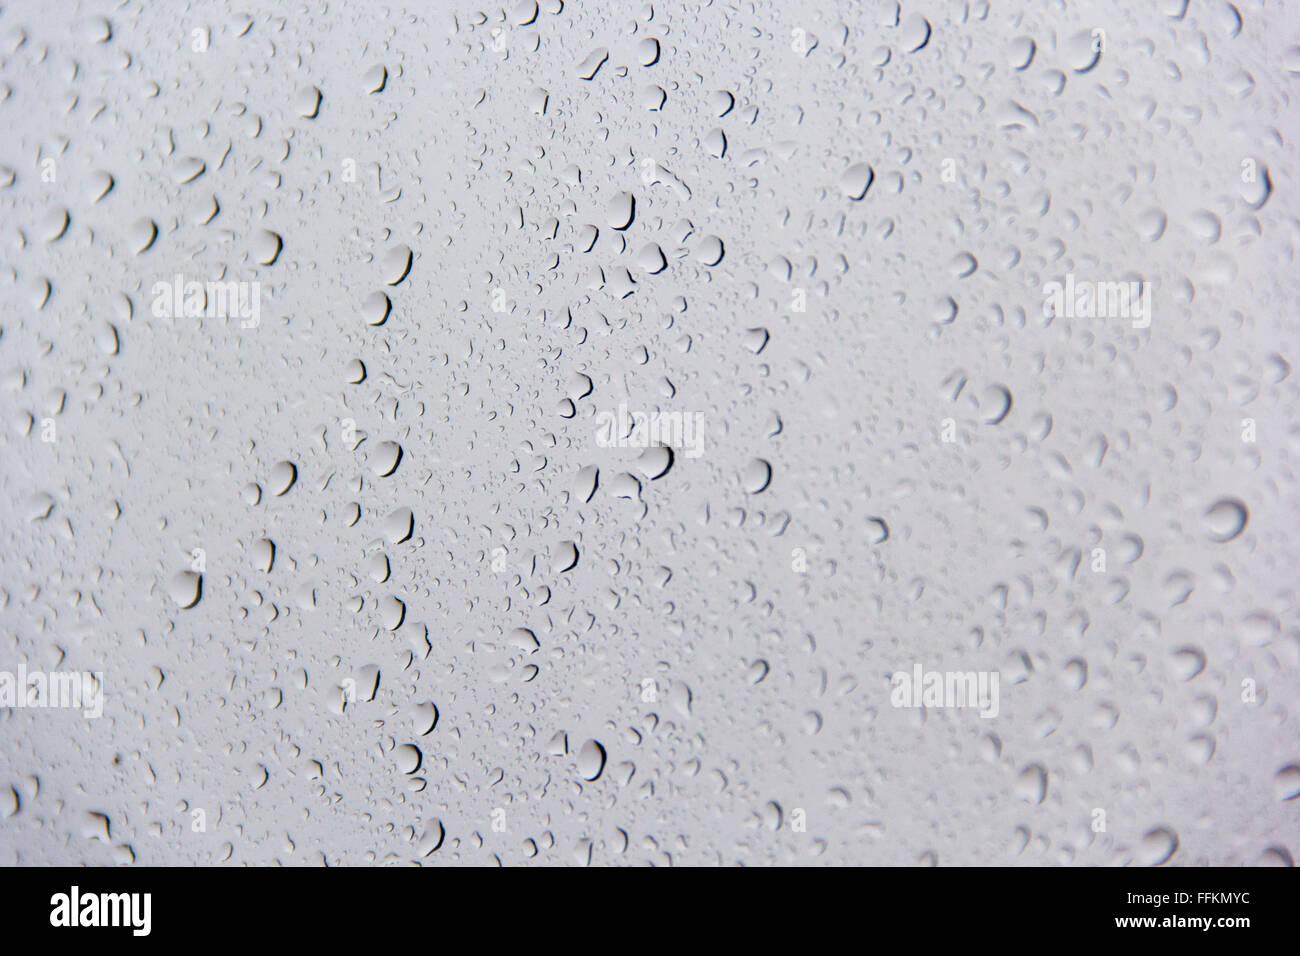 drop, bead, gout, blob, drip, trickle, dribble, tear, minim, arthritis, podagra, chalk-stone, rain, rainfall, water, - Stock Image